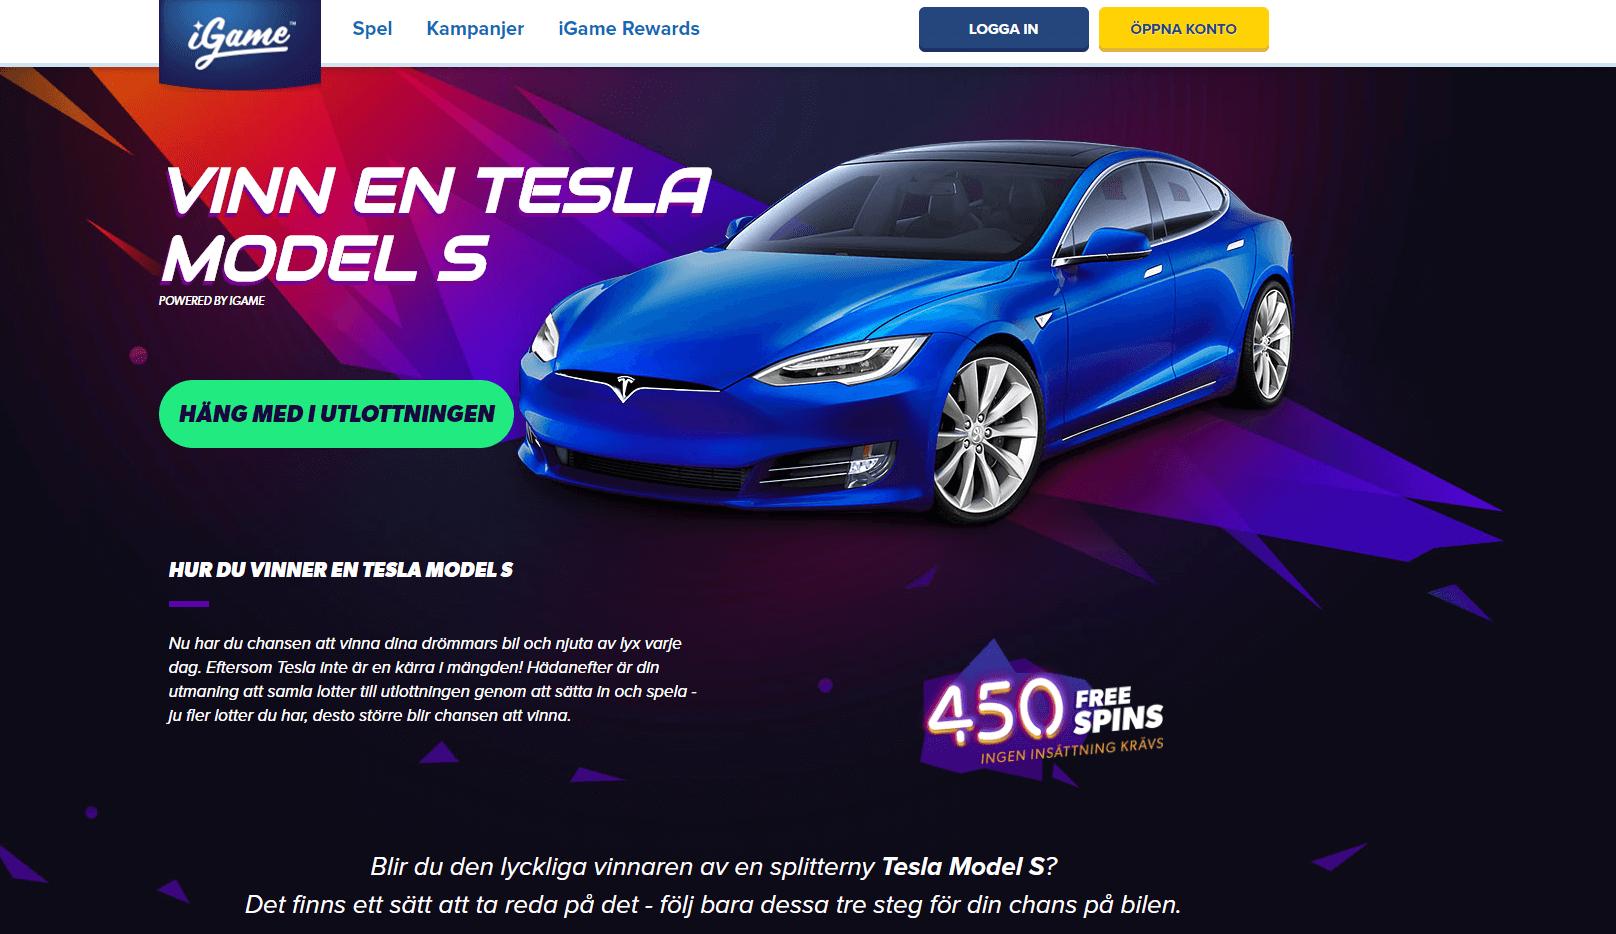 Vinn en Tesla bil